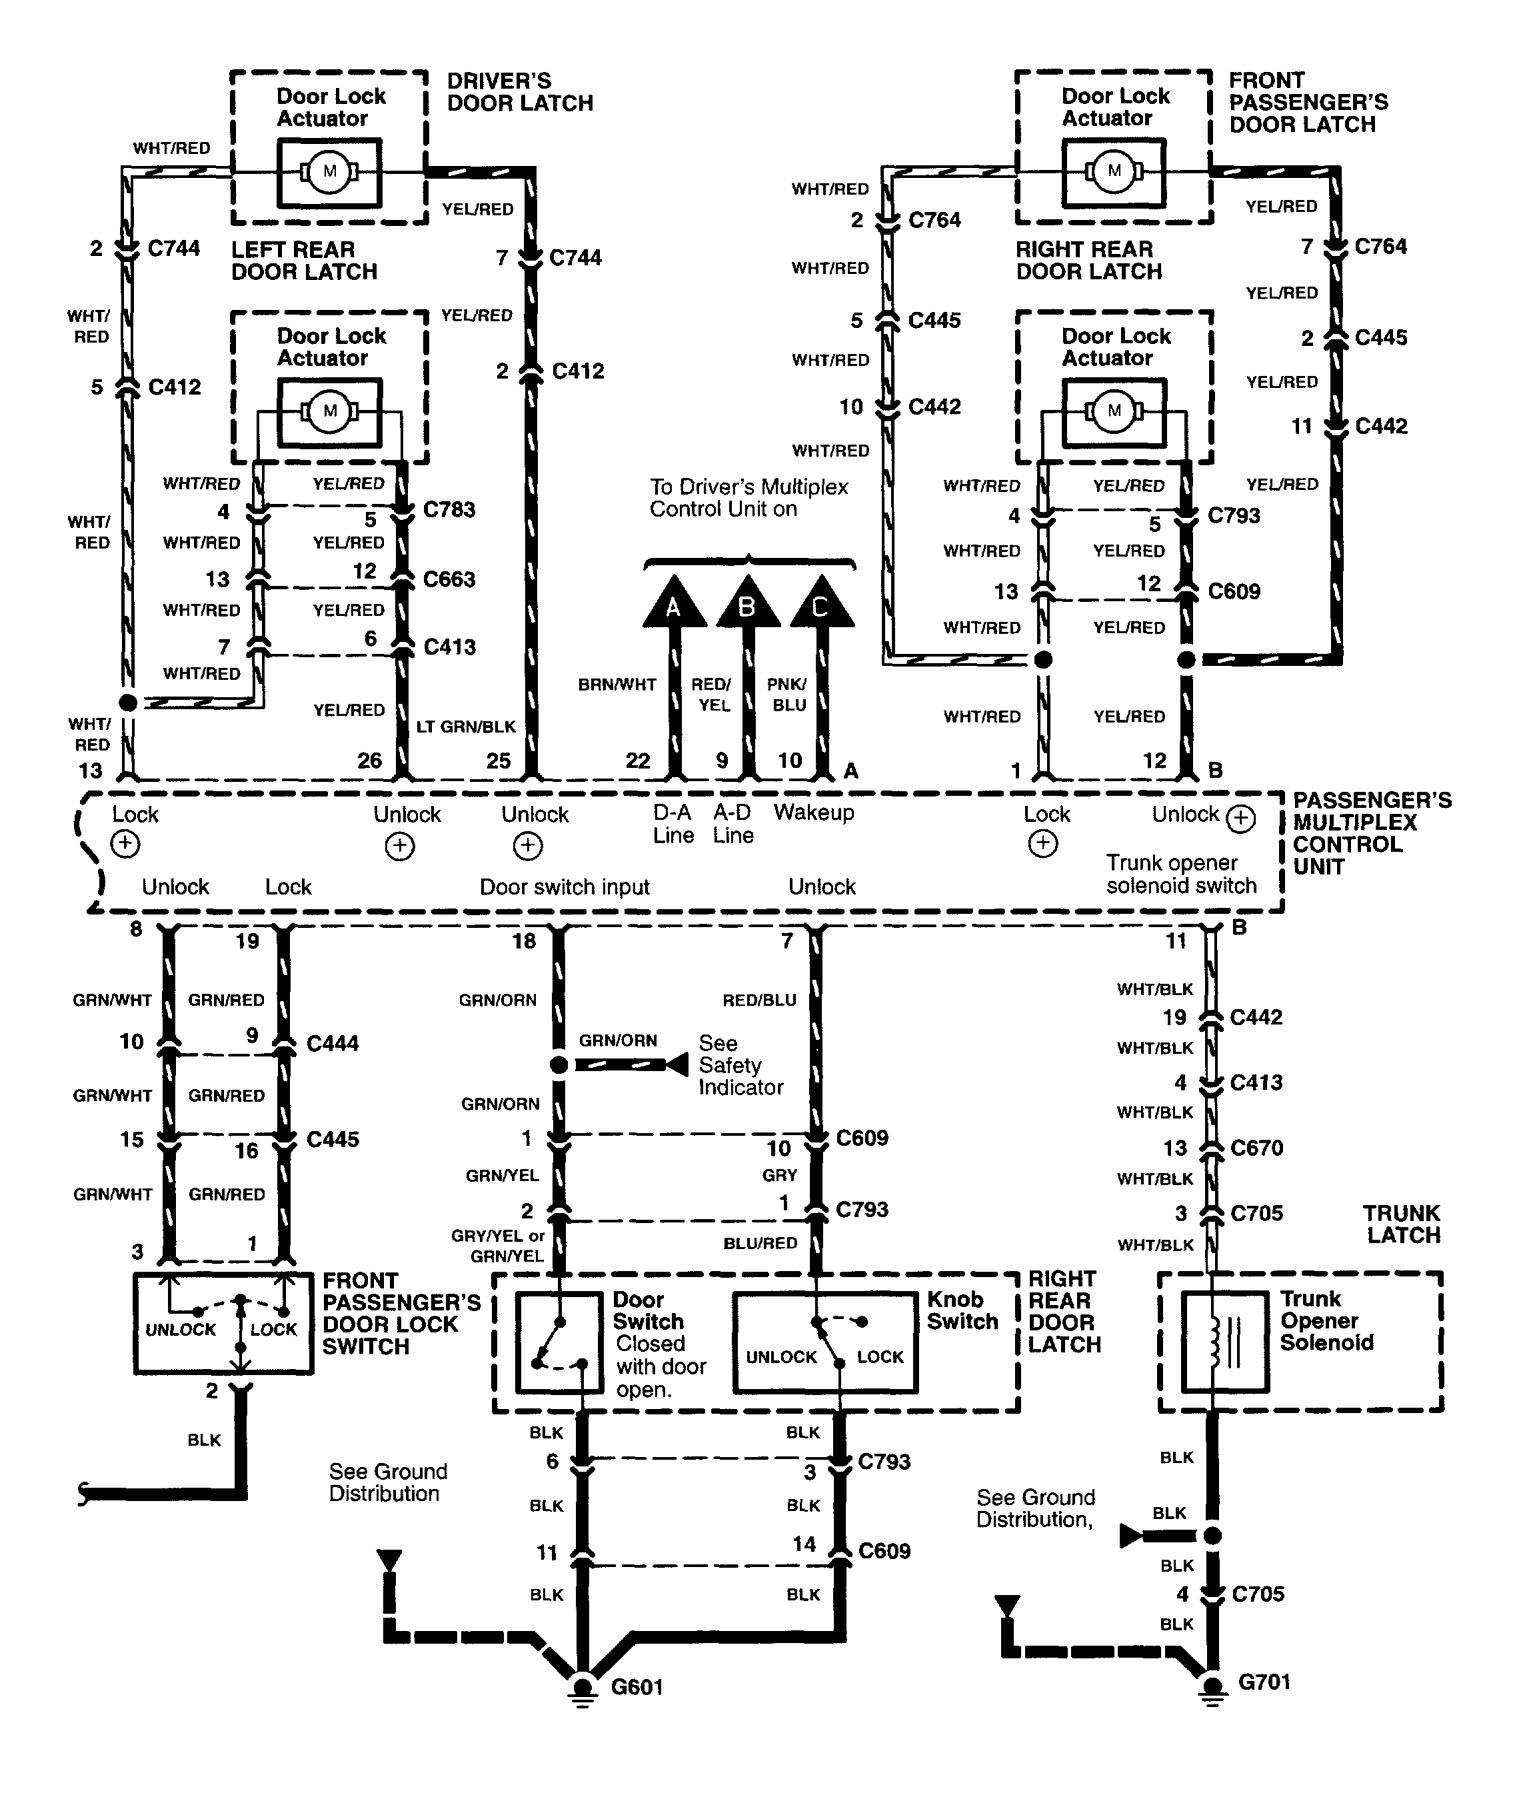 Nissan Sentra Gxe Fuse Box Diagram